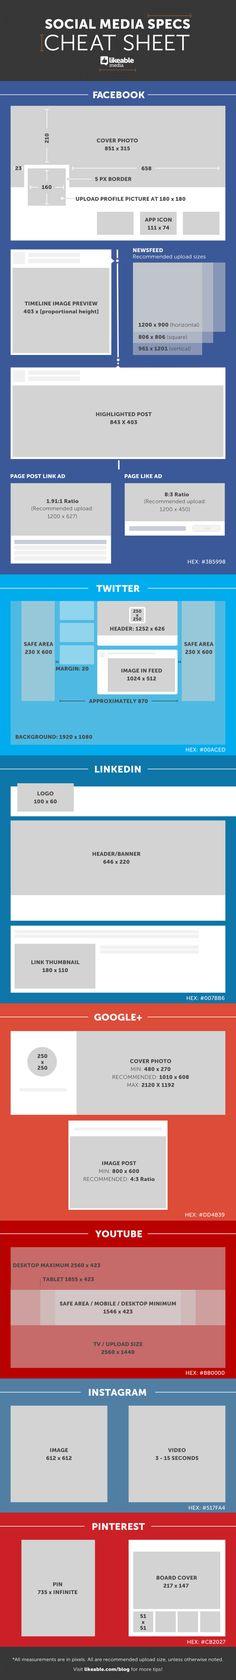 Social Media specs cheat sheet #infographic